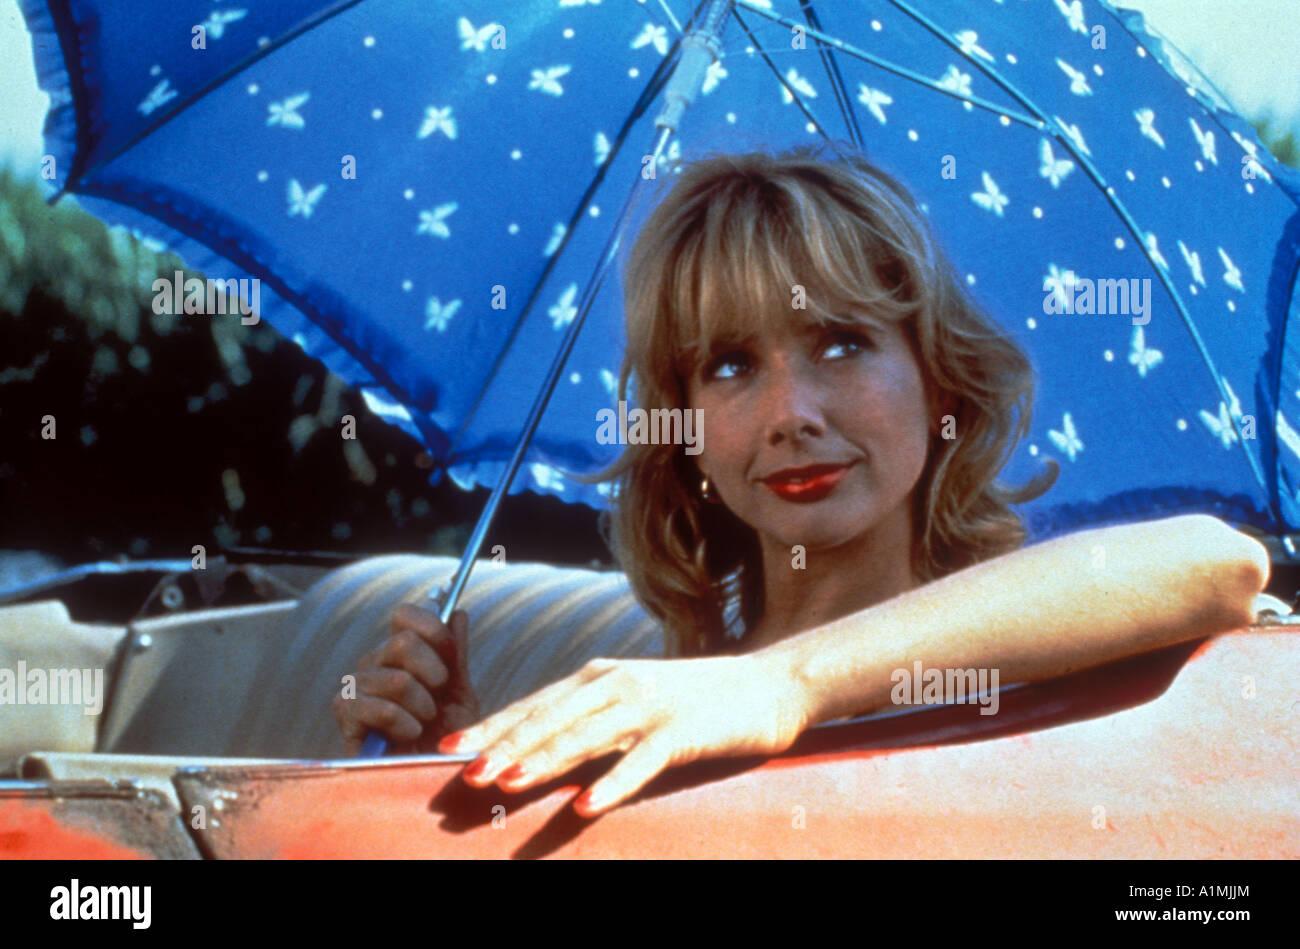 The Wrong Man Year 1993 Director Jim McBride Rosanna Arquette Stock Photo